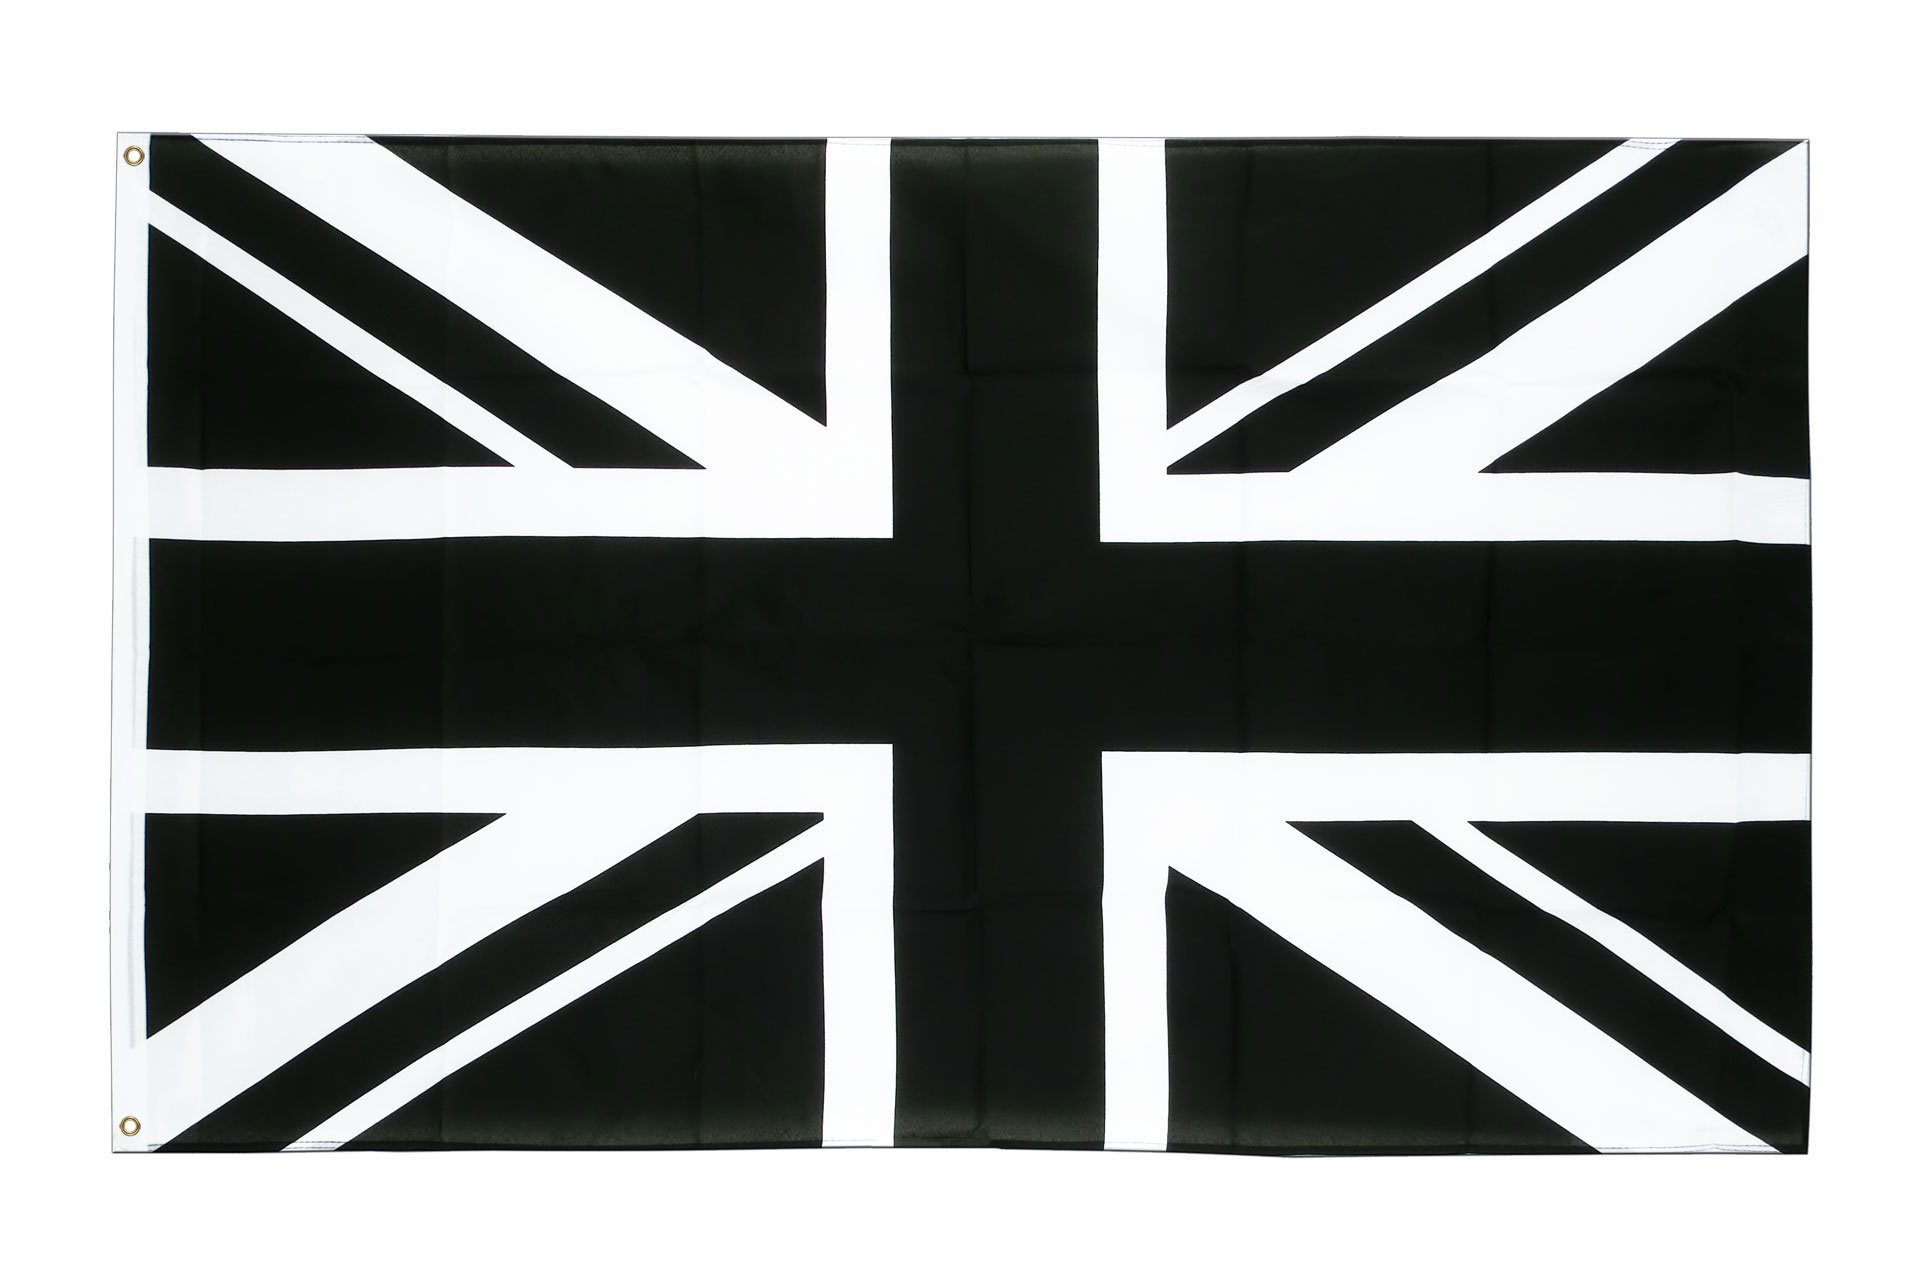 buy union jack black flag 3x5 ft 90x150 cm royal flags. Black Bedroom Furniture Sets. Home Design Ideas